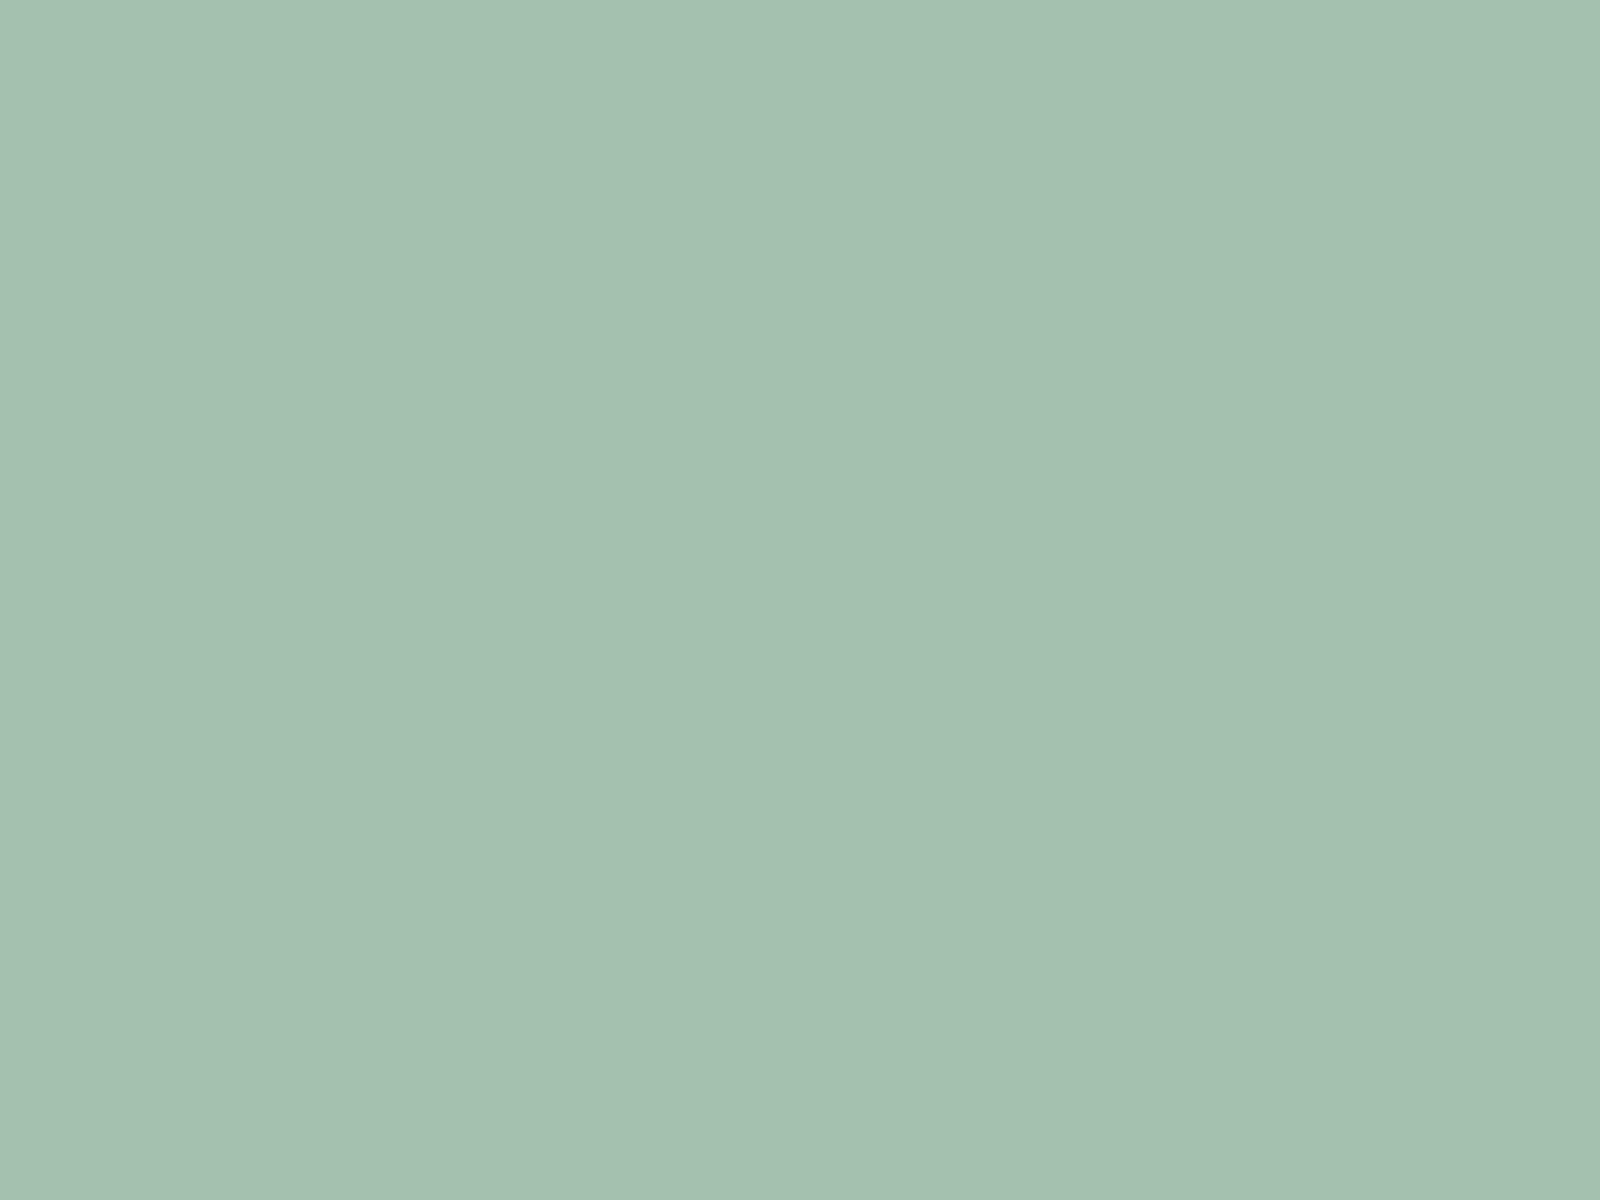 1600x1200 Cambridge Blue Solid Color Background